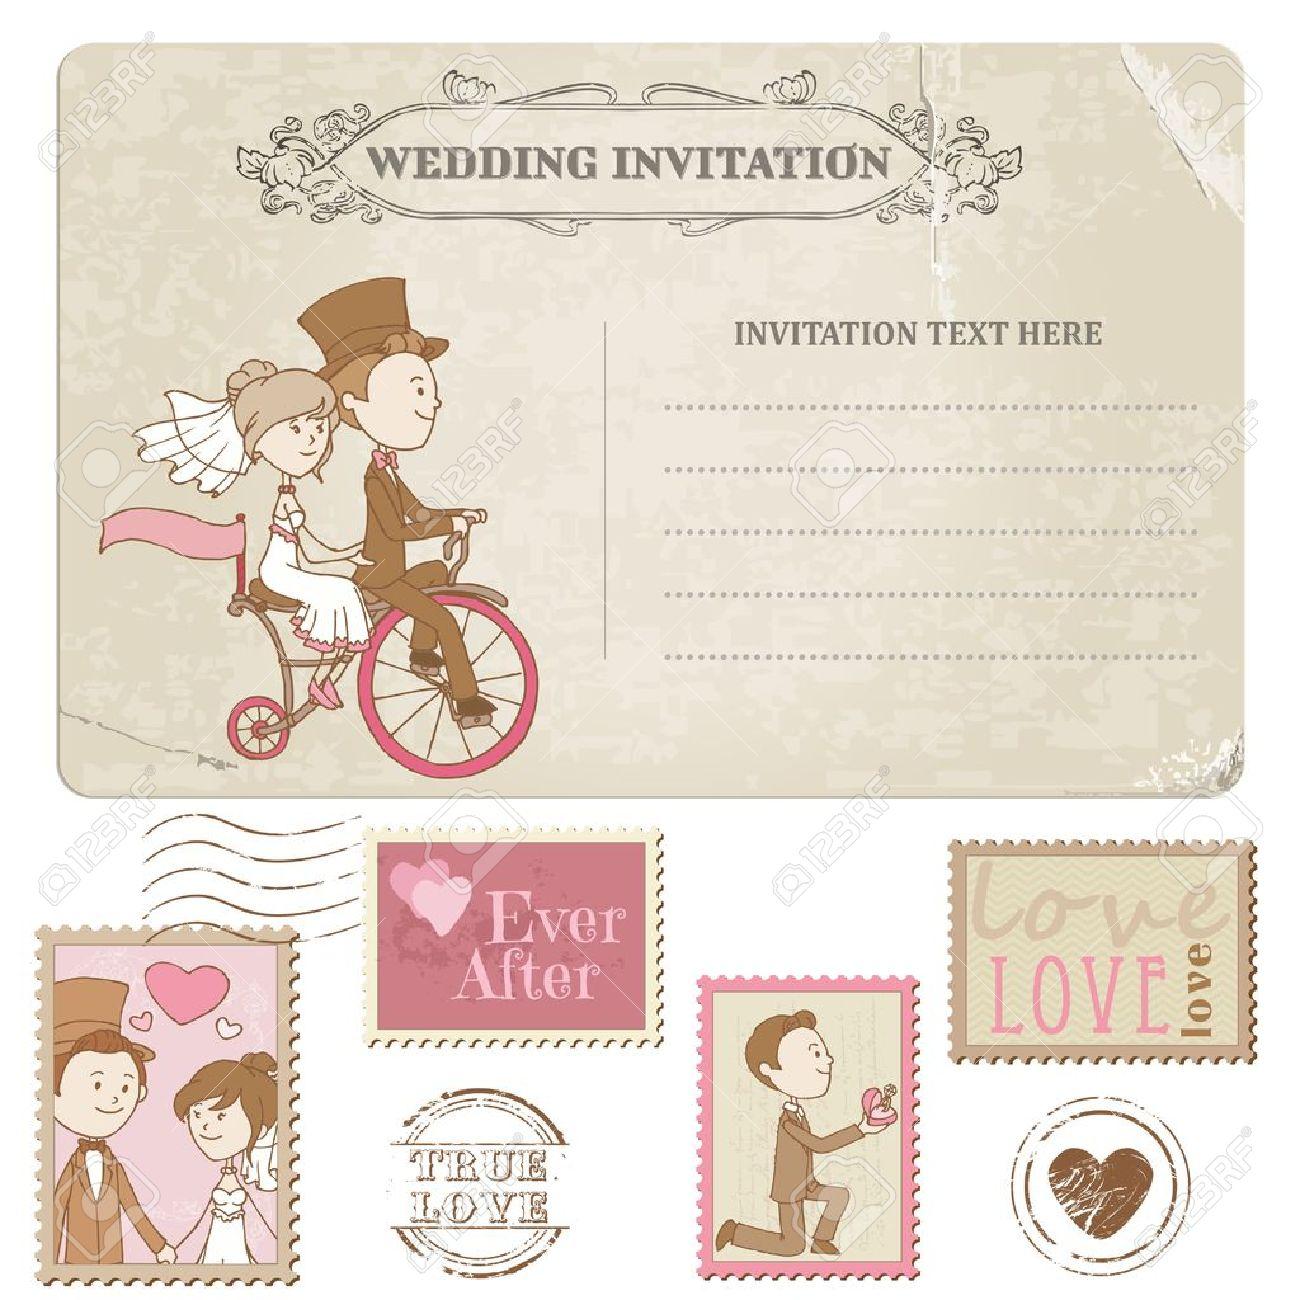 Wedding Postcard and Postage Stamps - for wedding design, invitation, congratulation, scrapbook Stock Vector - 14460645